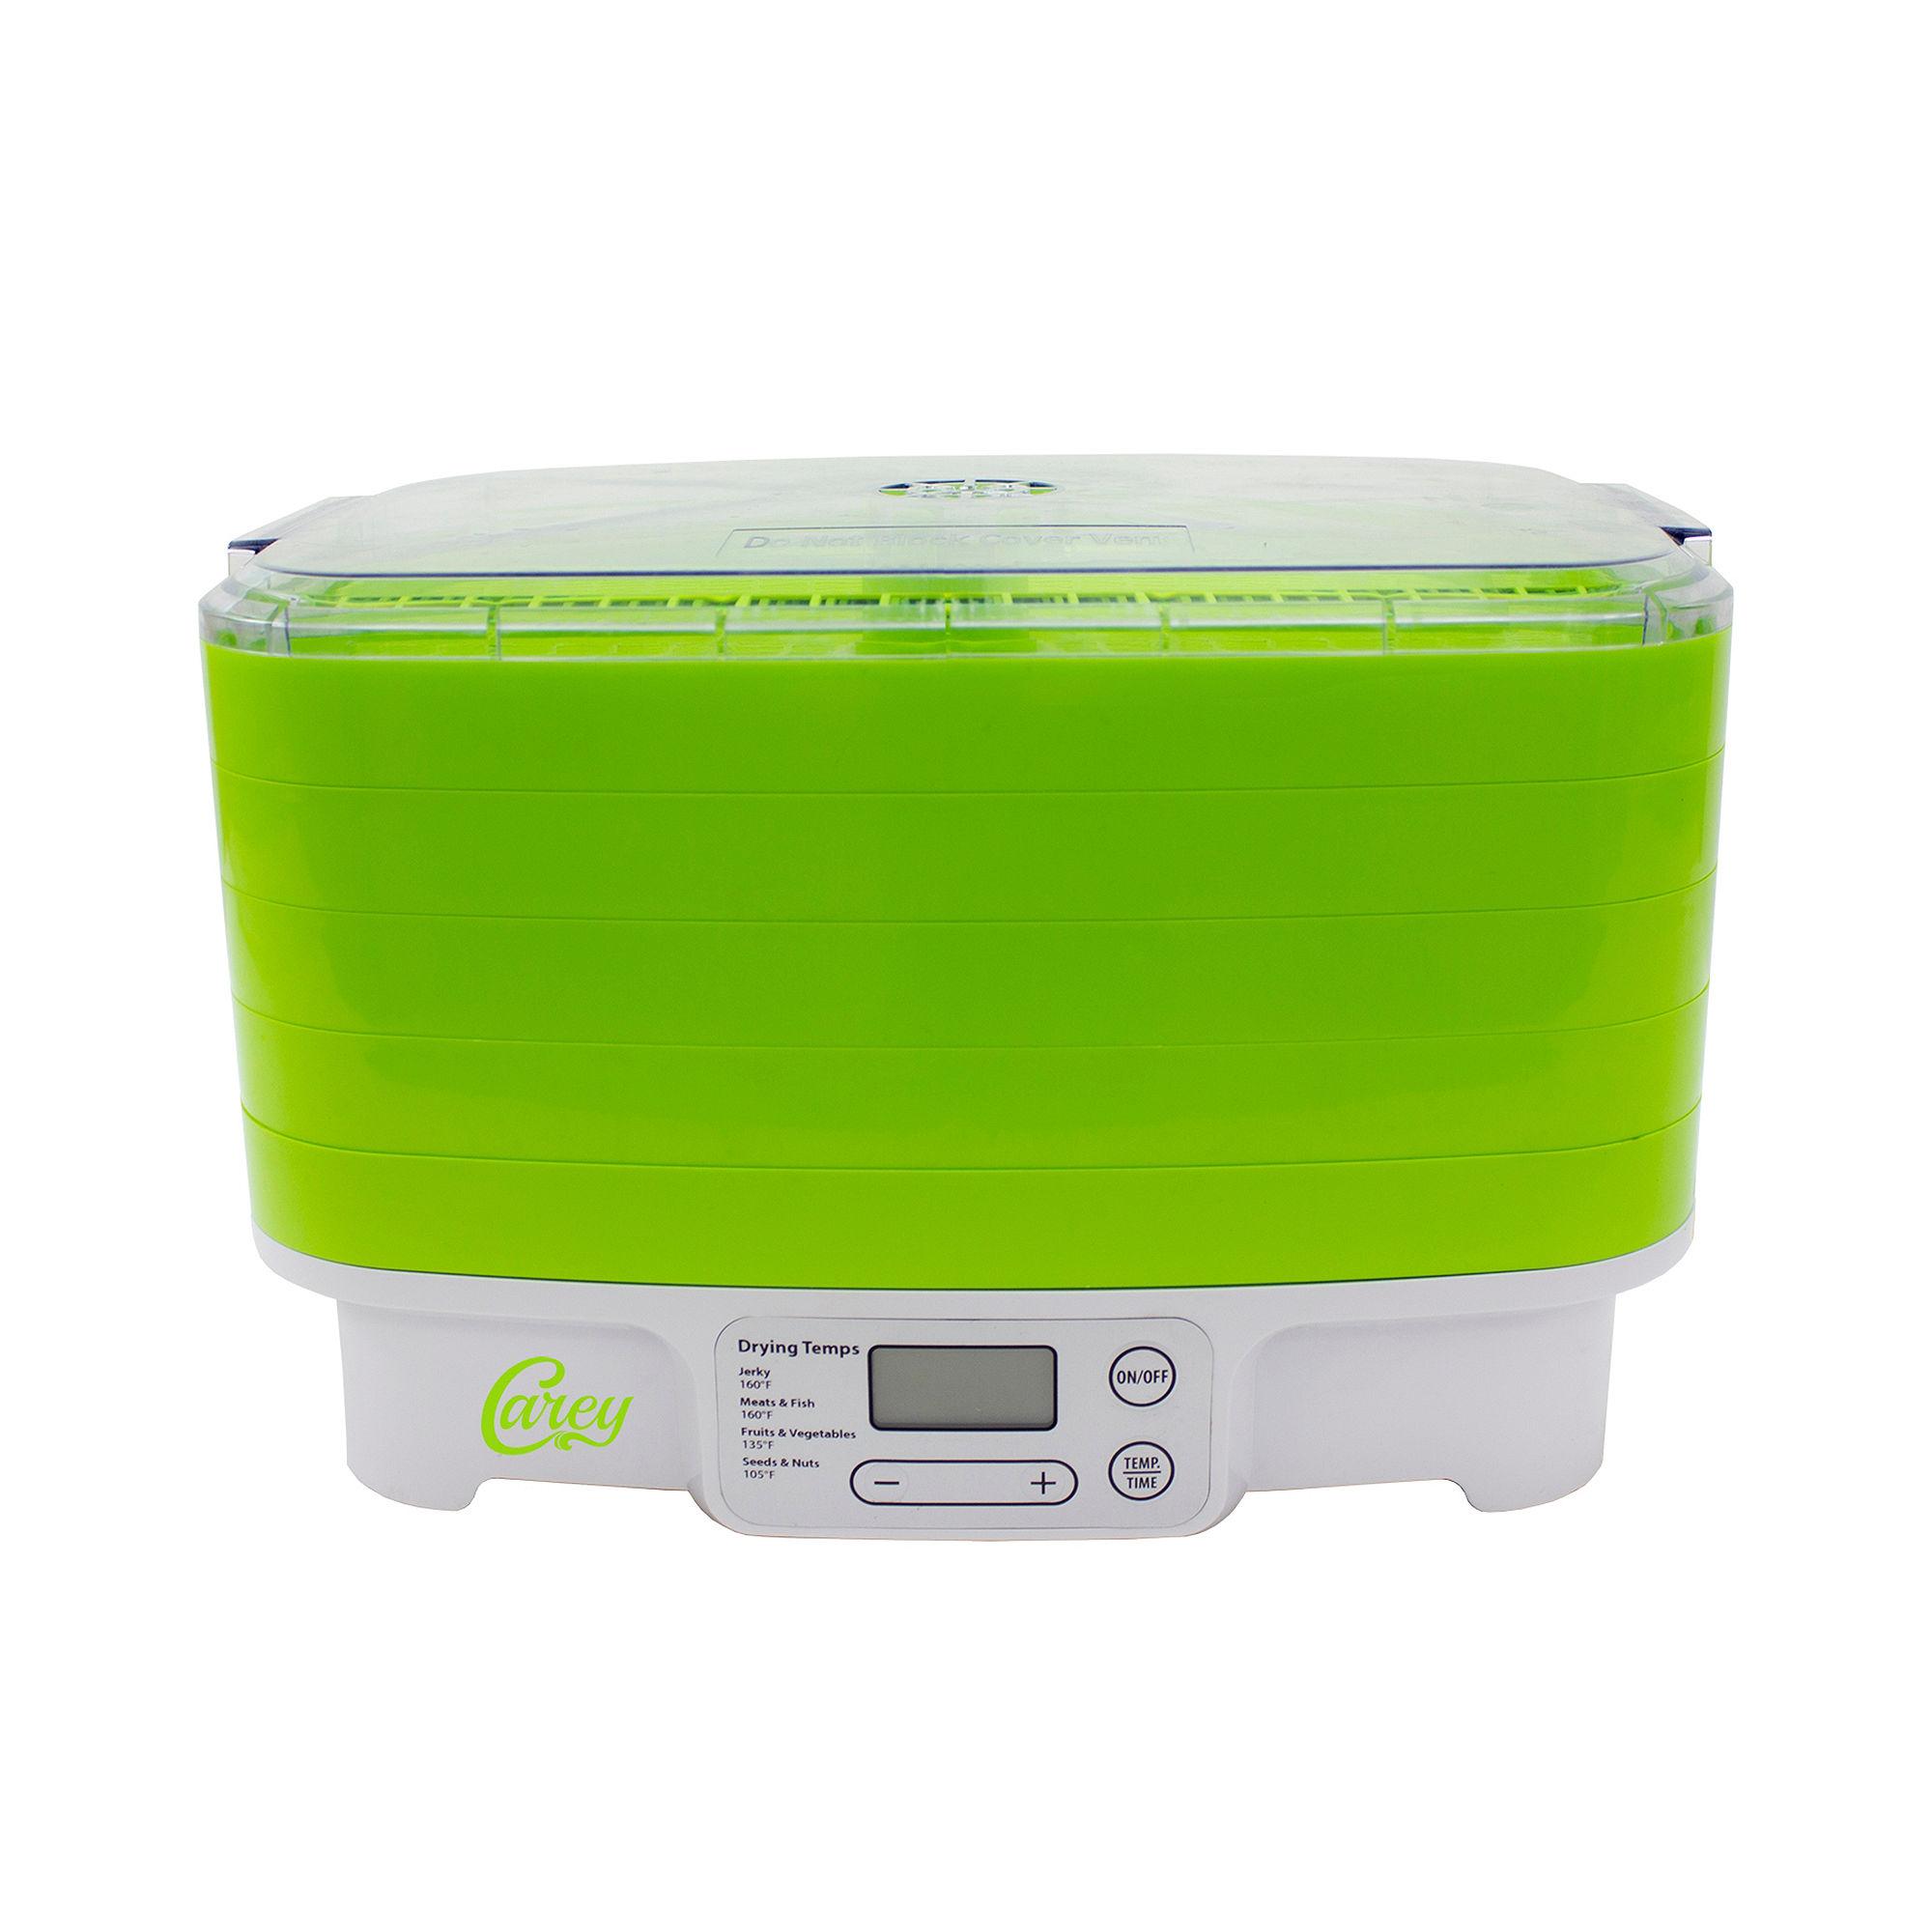 Carey 5-Tray Food Dehydrator